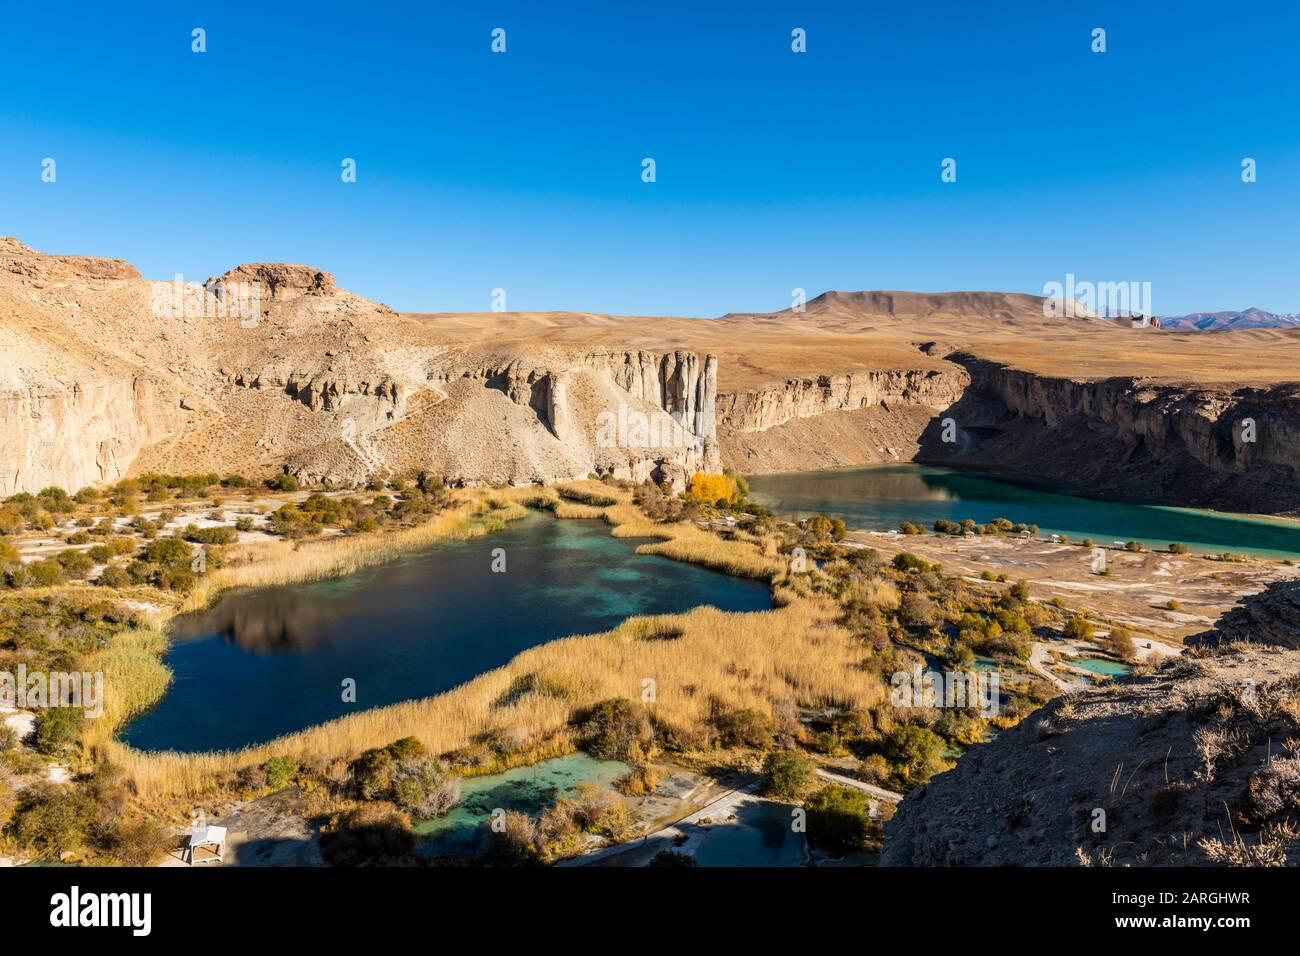 Vista sobre los lagos azules profundos del Parque Nacional Band-E-Amir, Afganistán, Asia Foto de stock